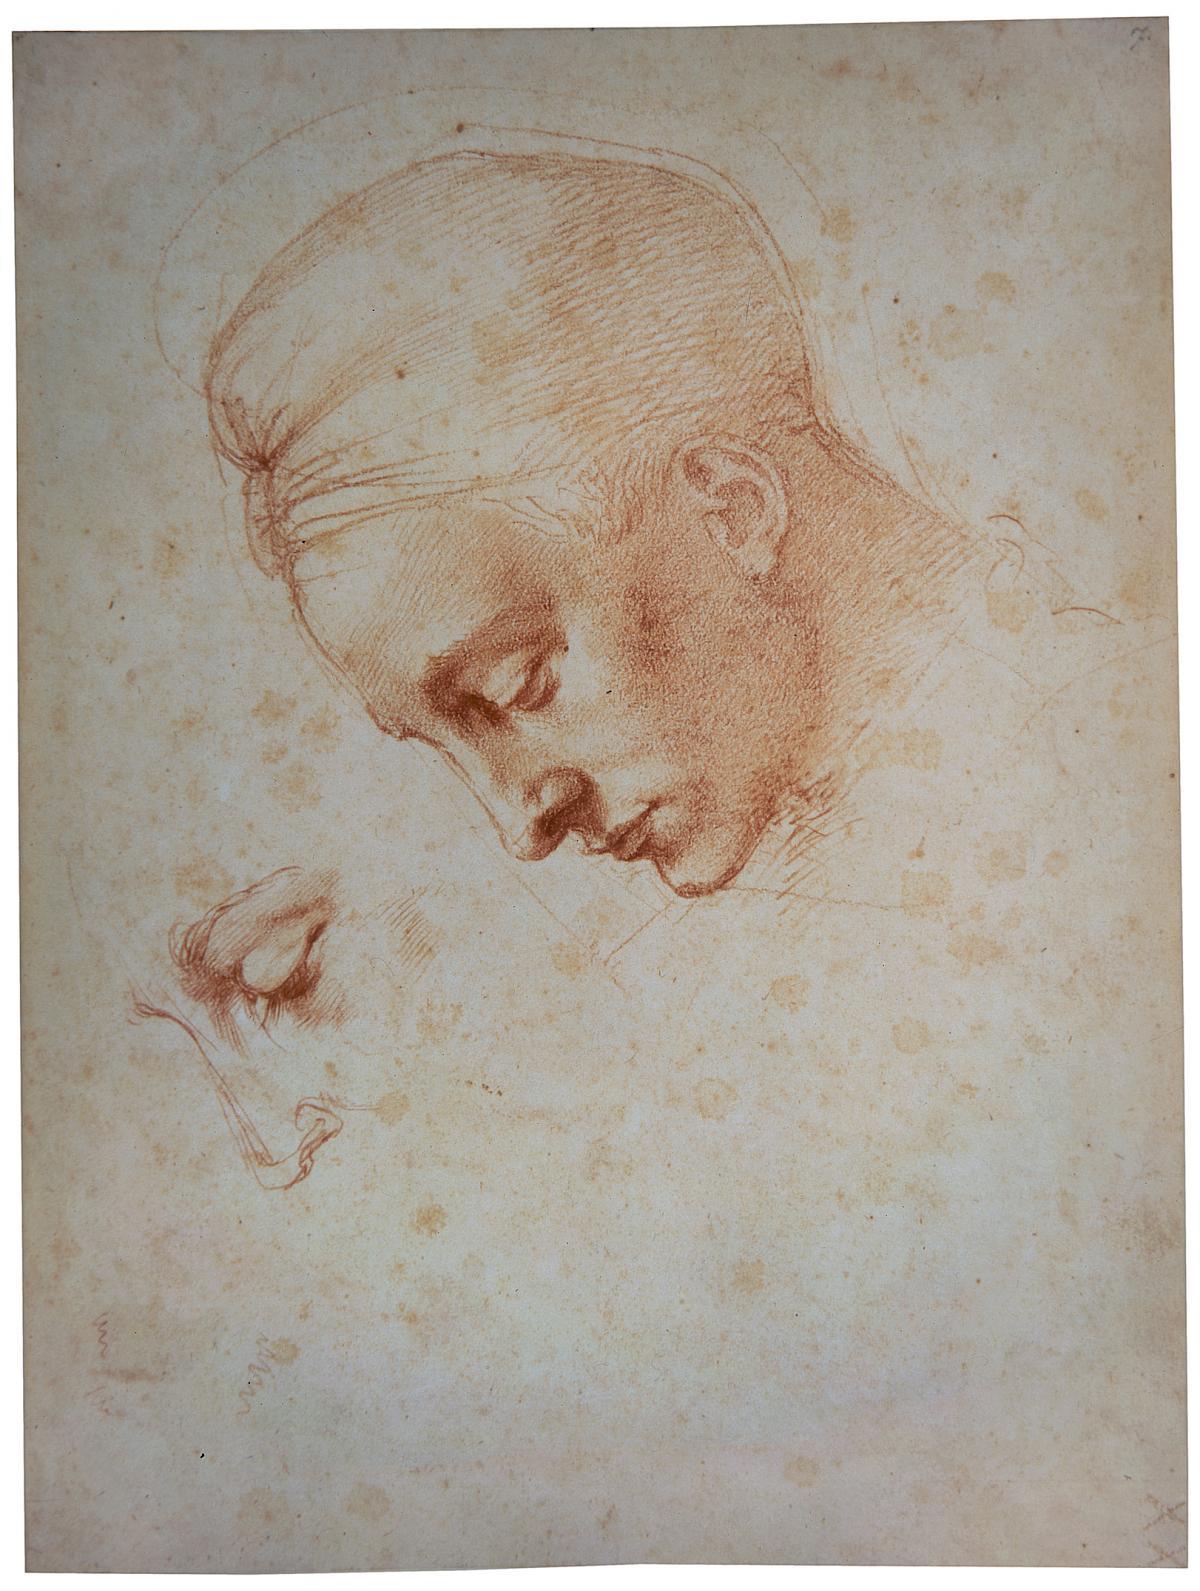 Michelangelo « The Albertina Museum Vienna